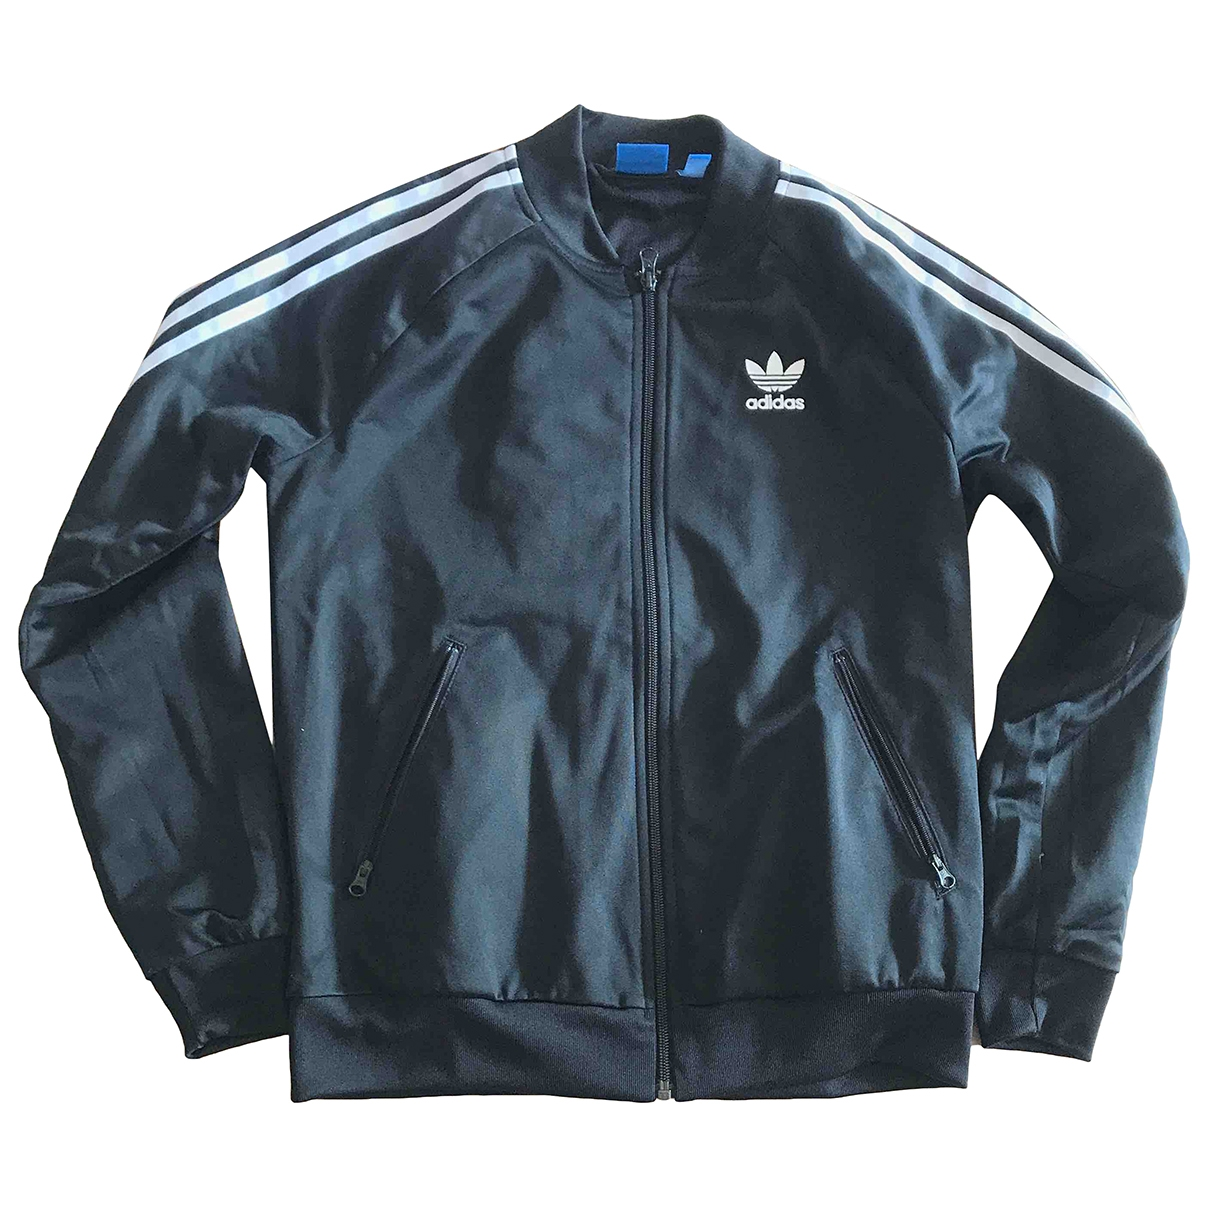 Adidas \N Black jacket for Women 44 IT